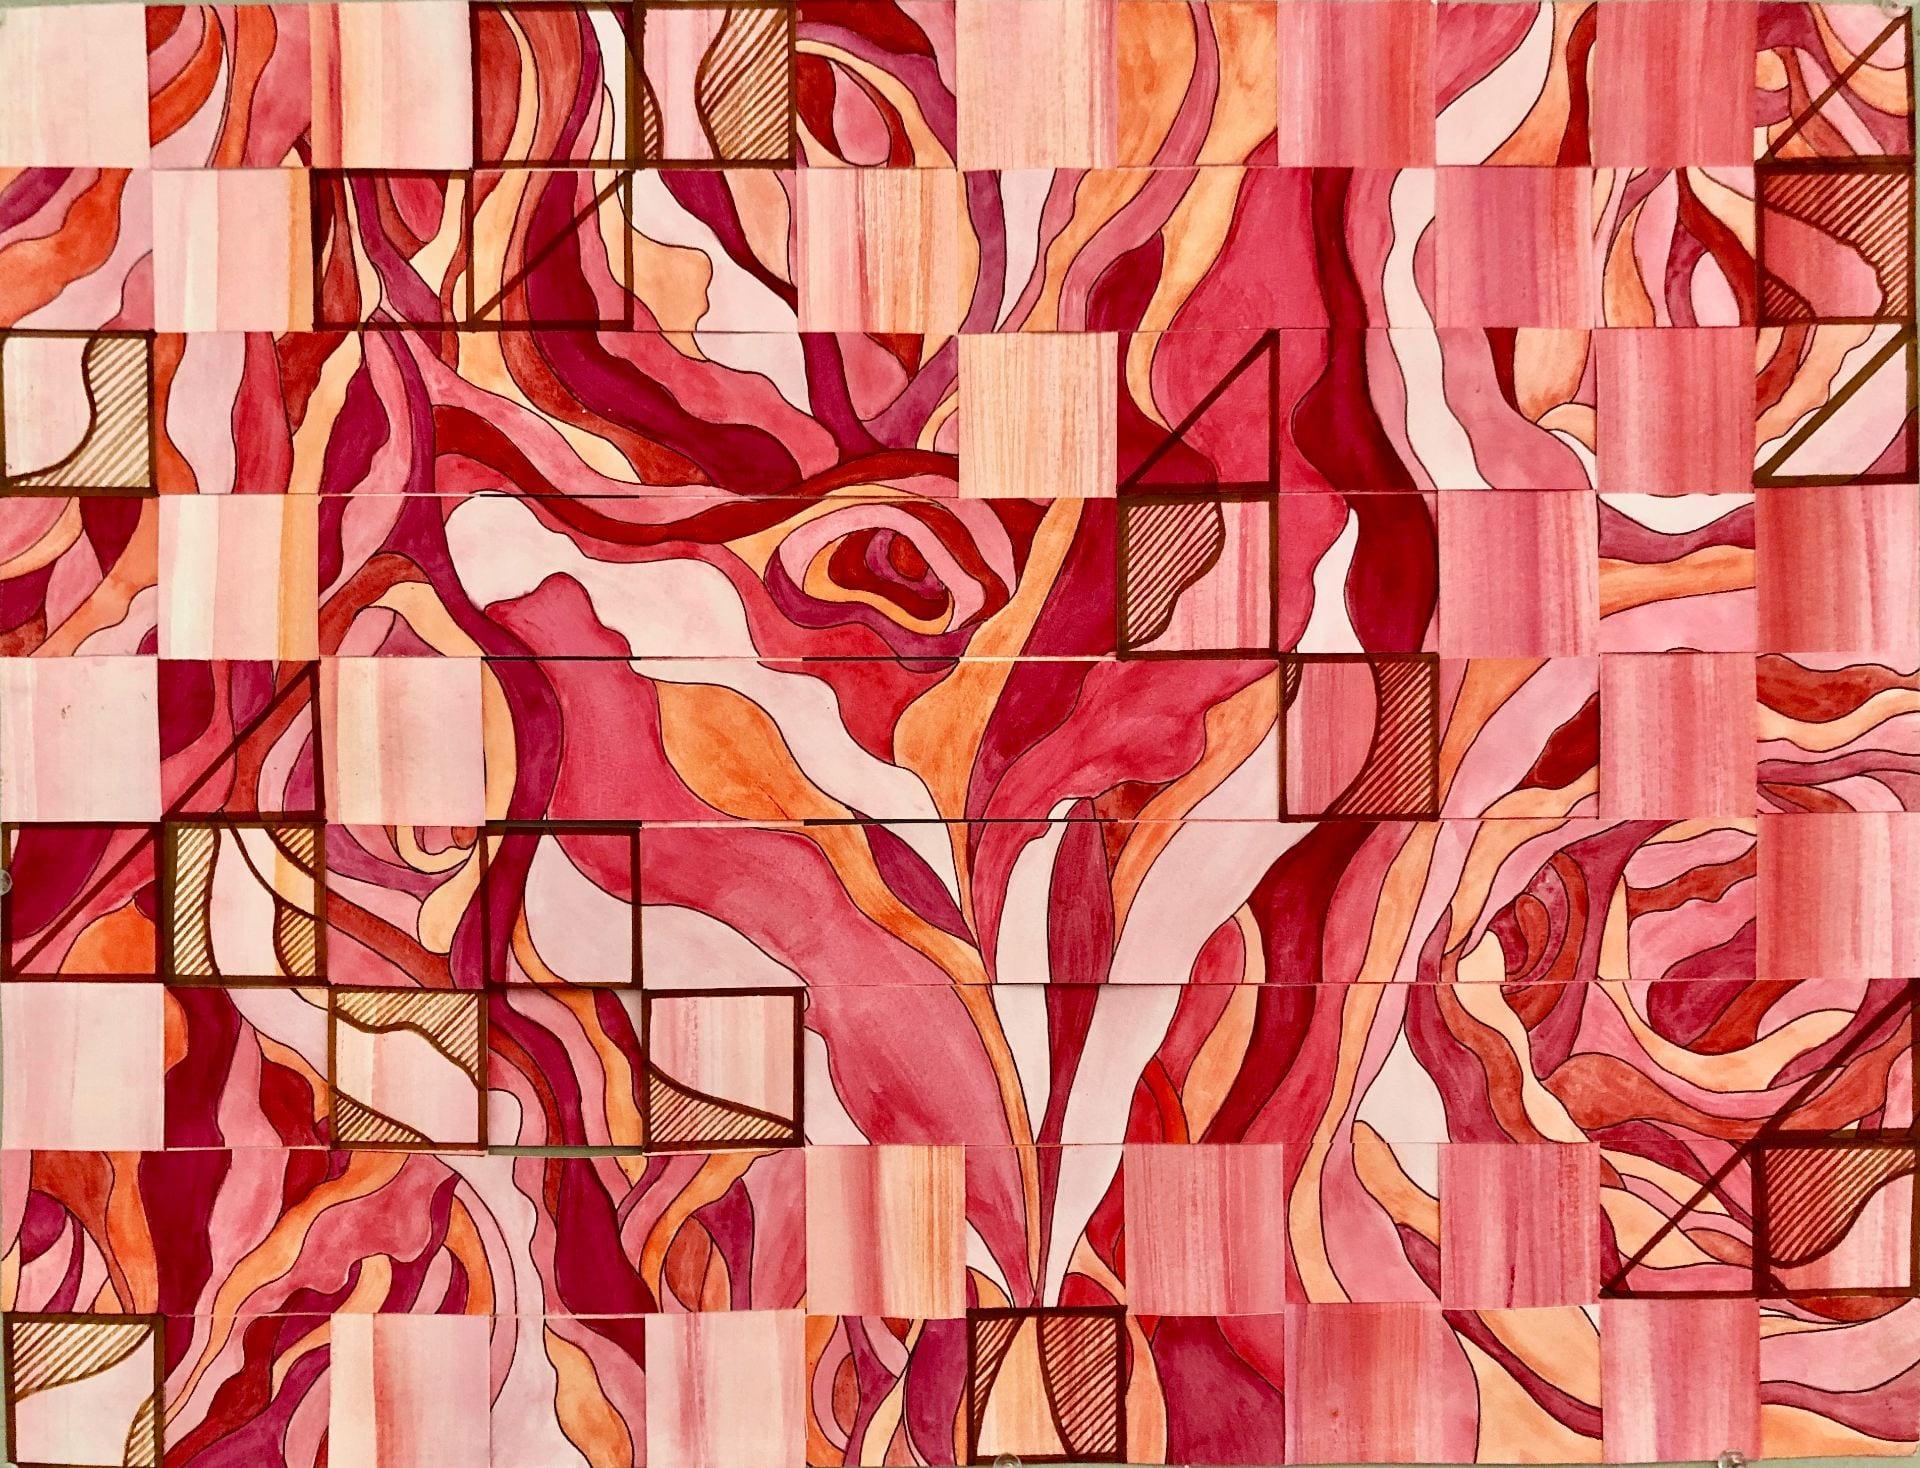 Final Piece – Gestalt Theory + Colour Theory